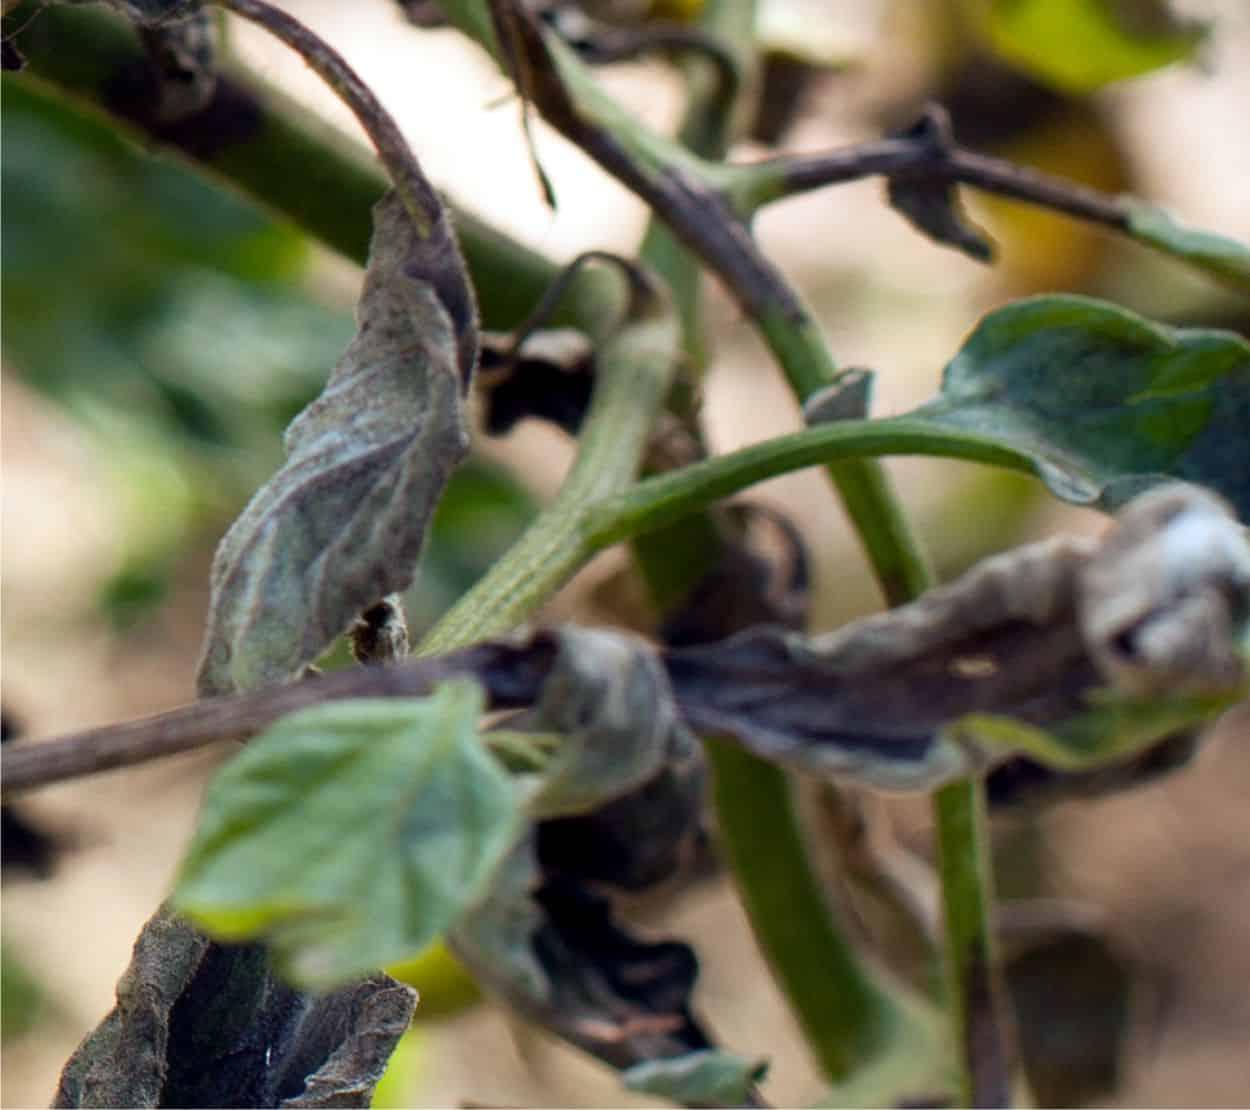 foglie nere con peronospora